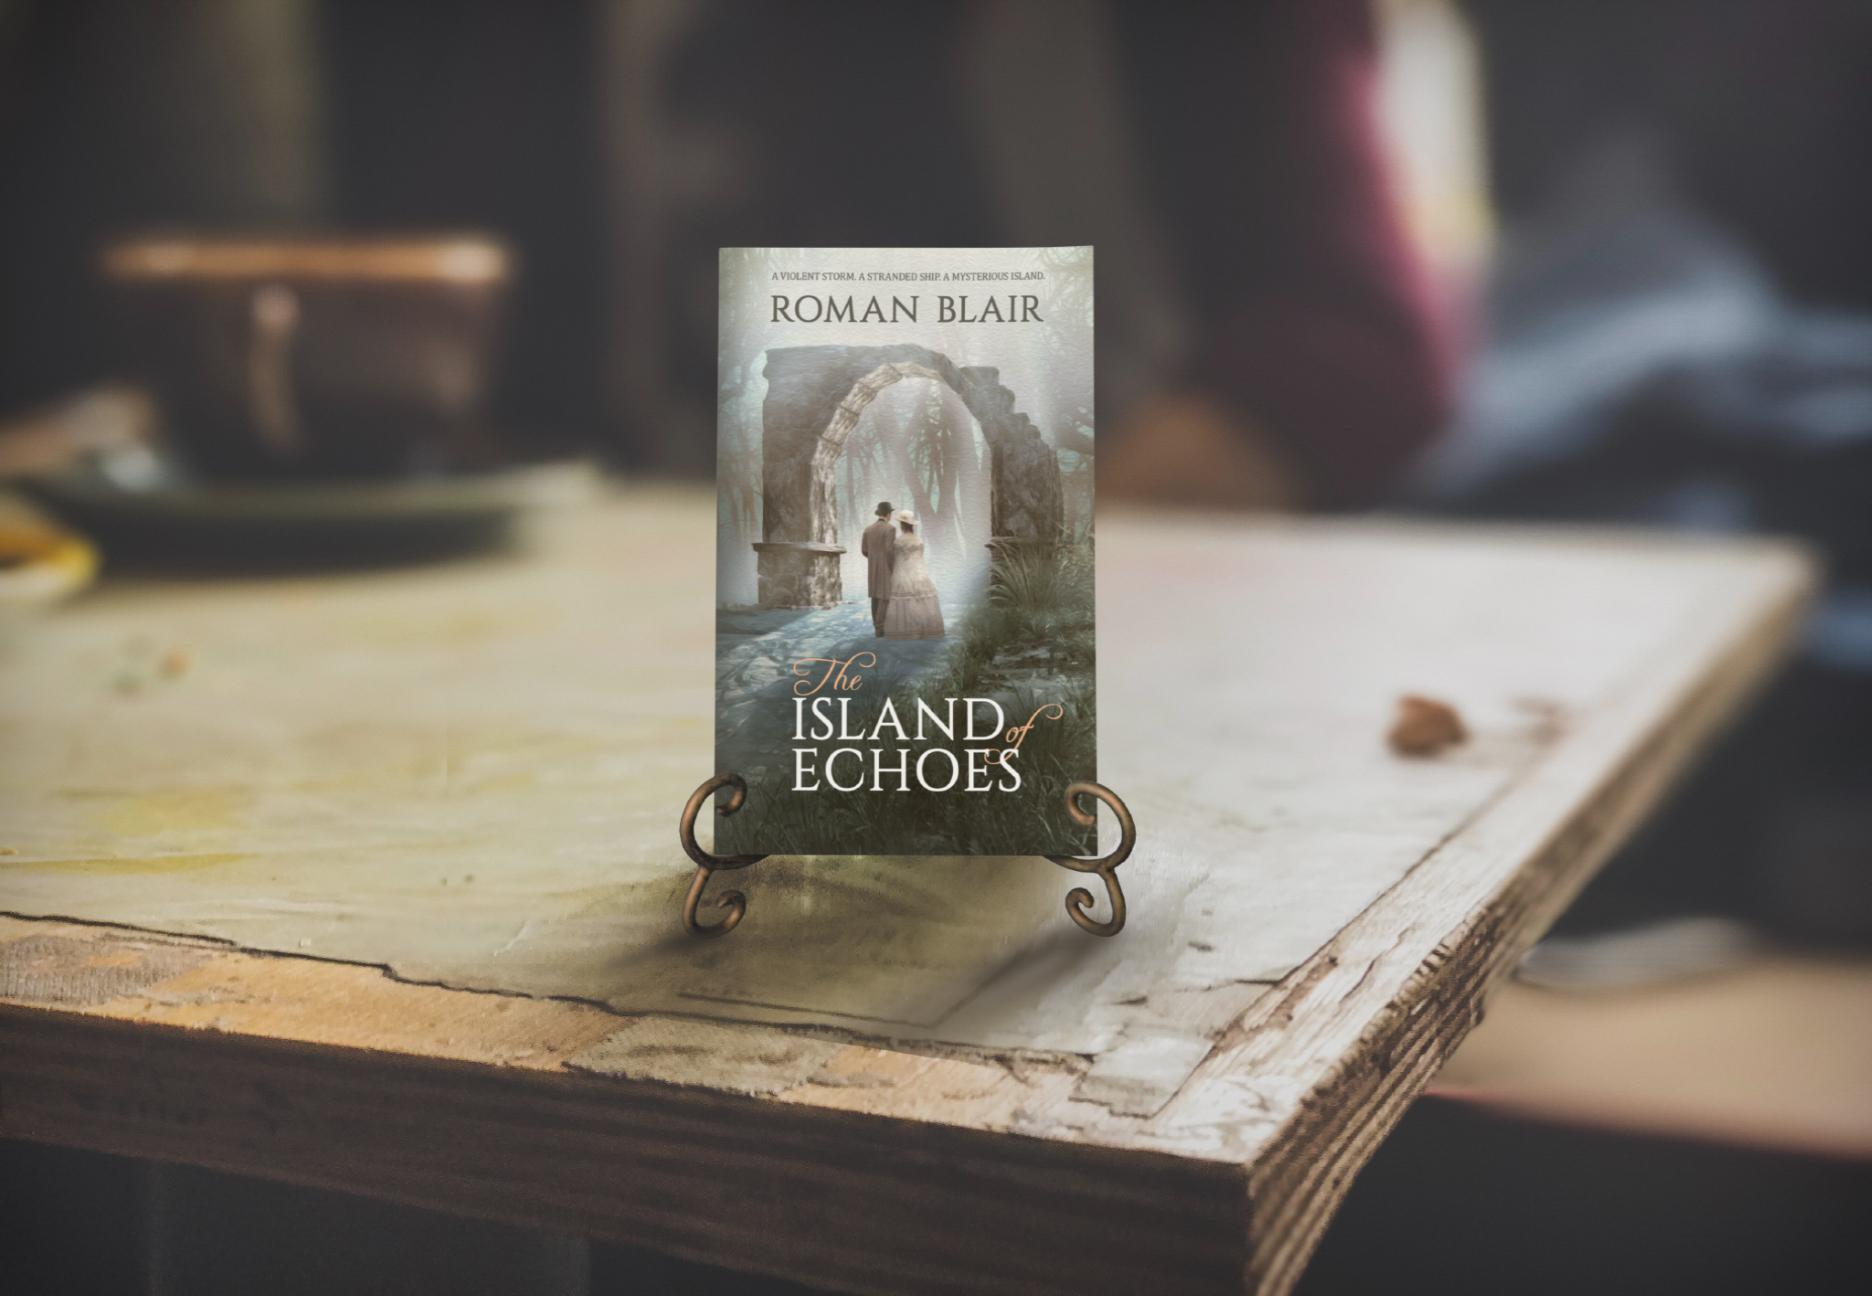 roman blair, roman gitlarz, science fiction, fantasy, author, artist, flash, fiction, stories, blog